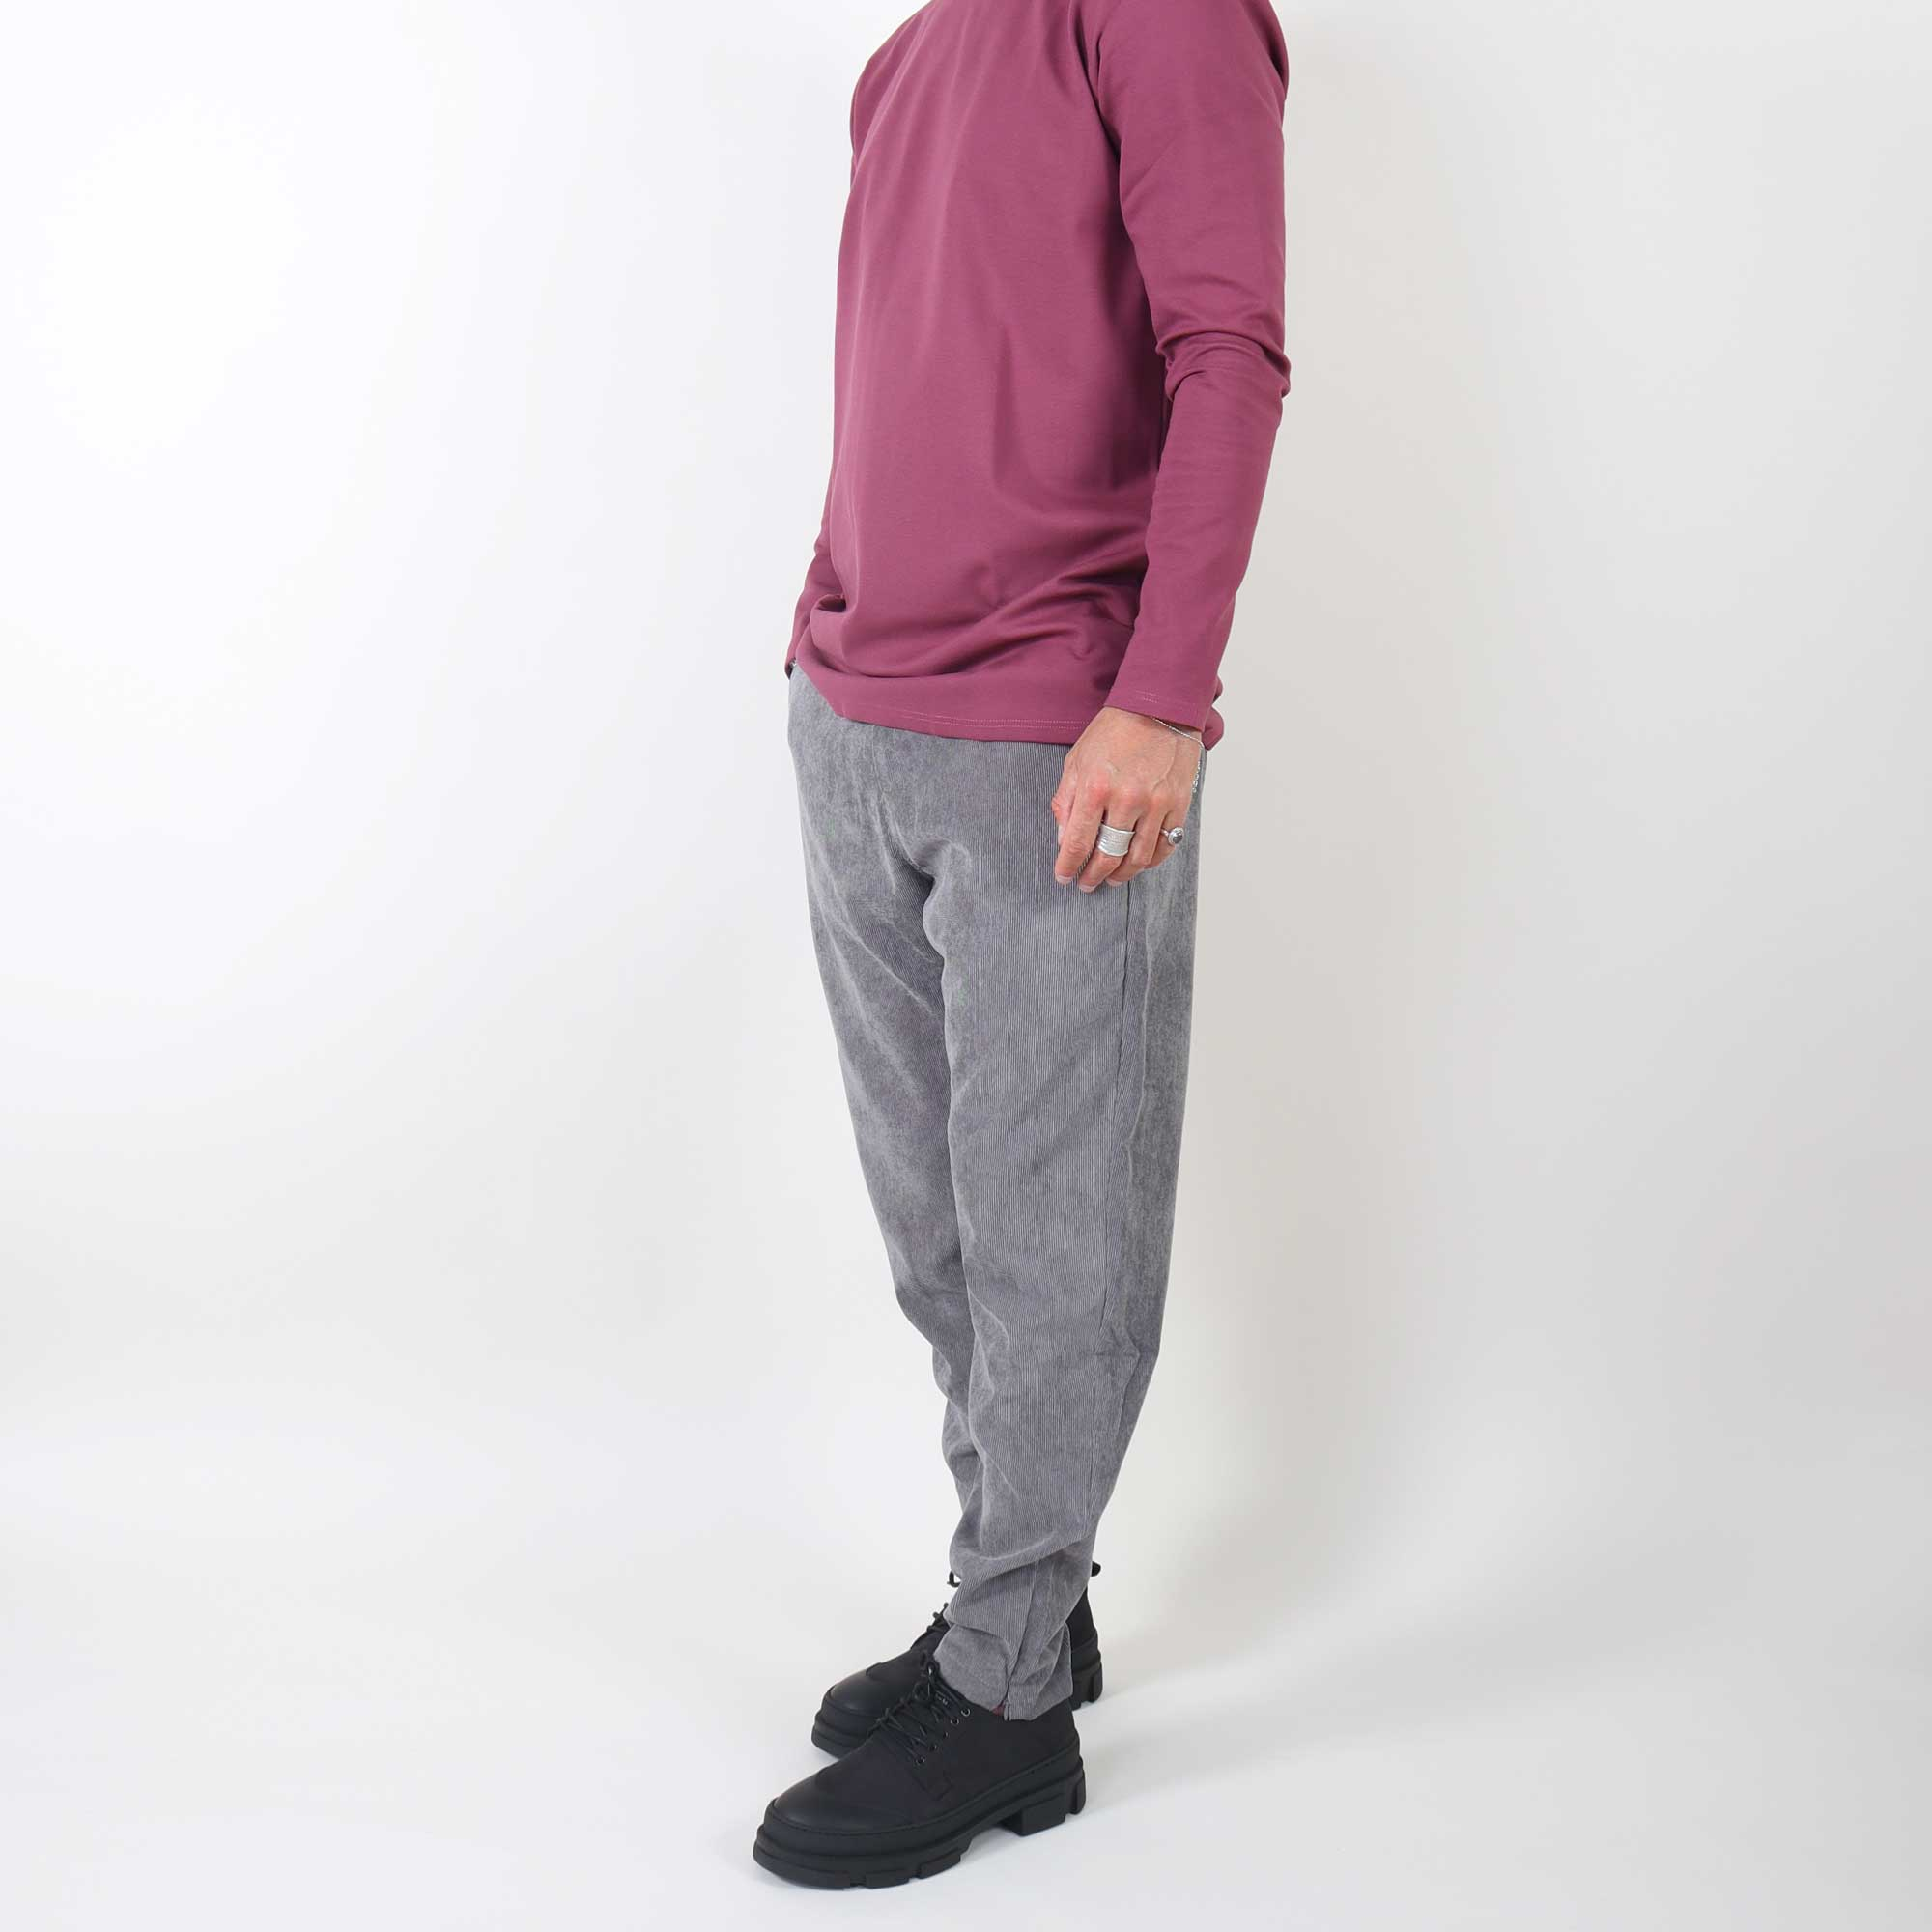 pantalon-rib-lgrey-1